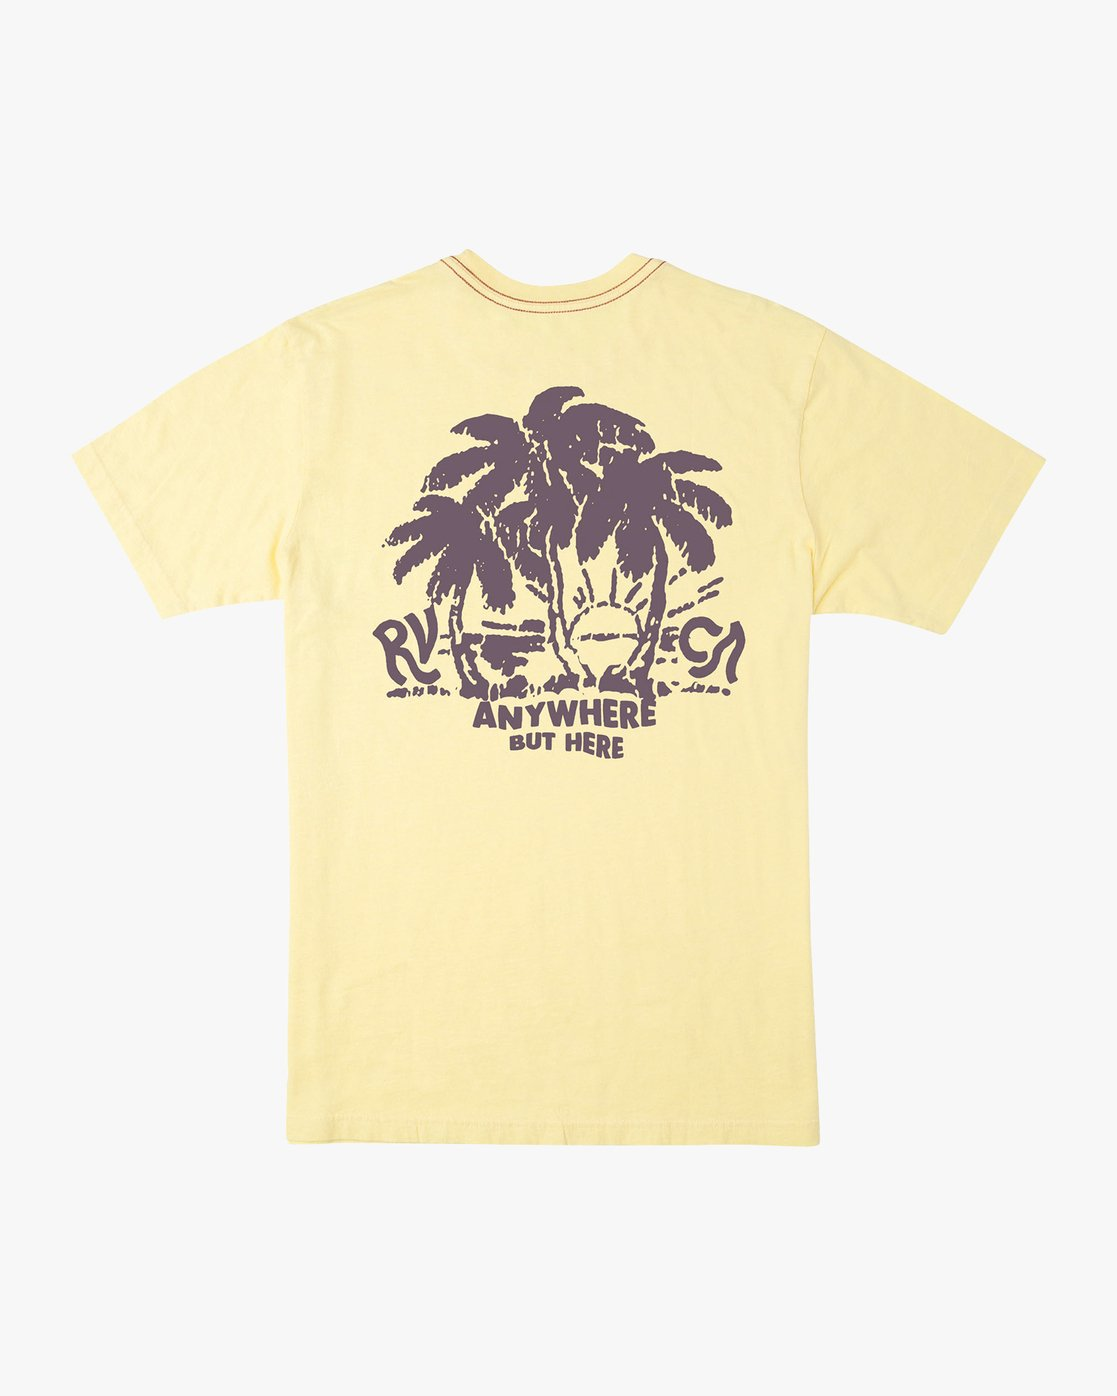 0 Alex Smith Anywhere T-Shirt Yellow M430URAN RVCA